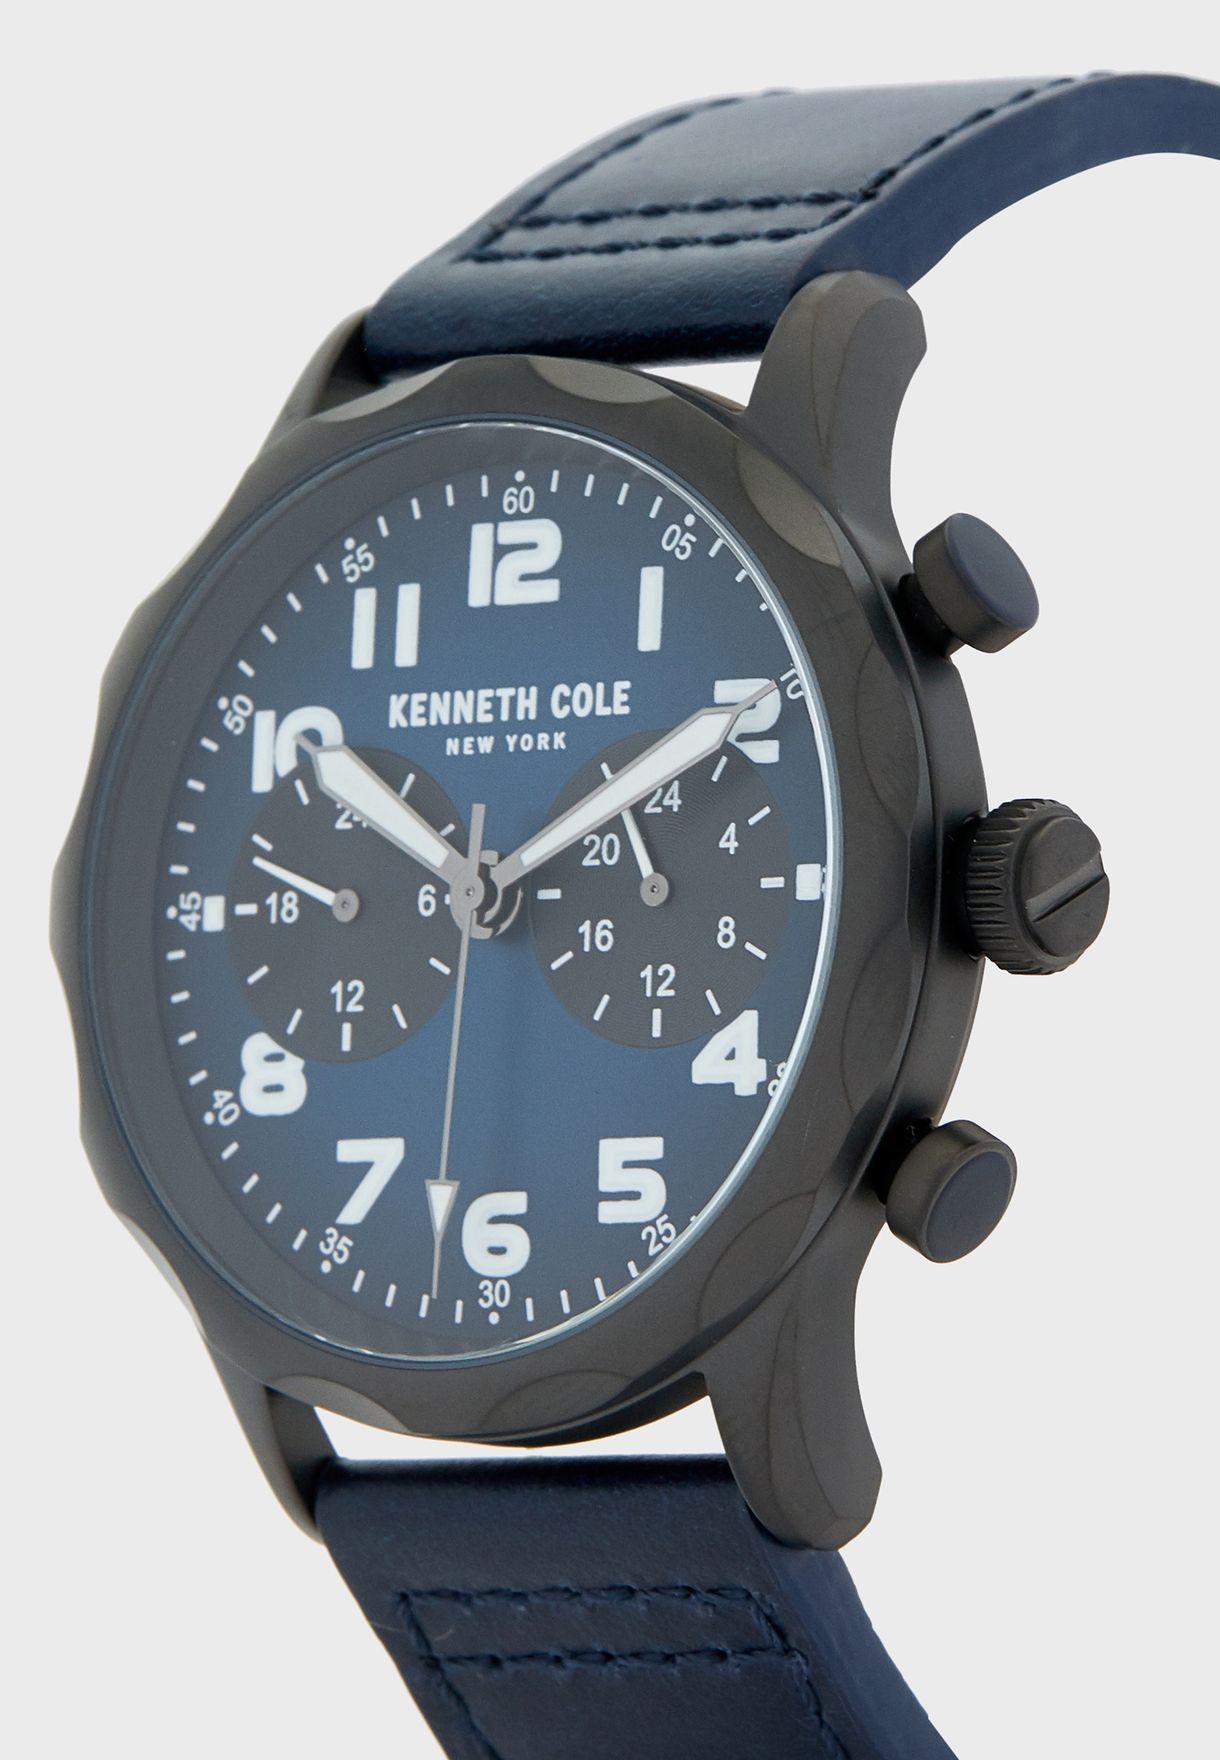 Kc51026002 Modern Analog Watch